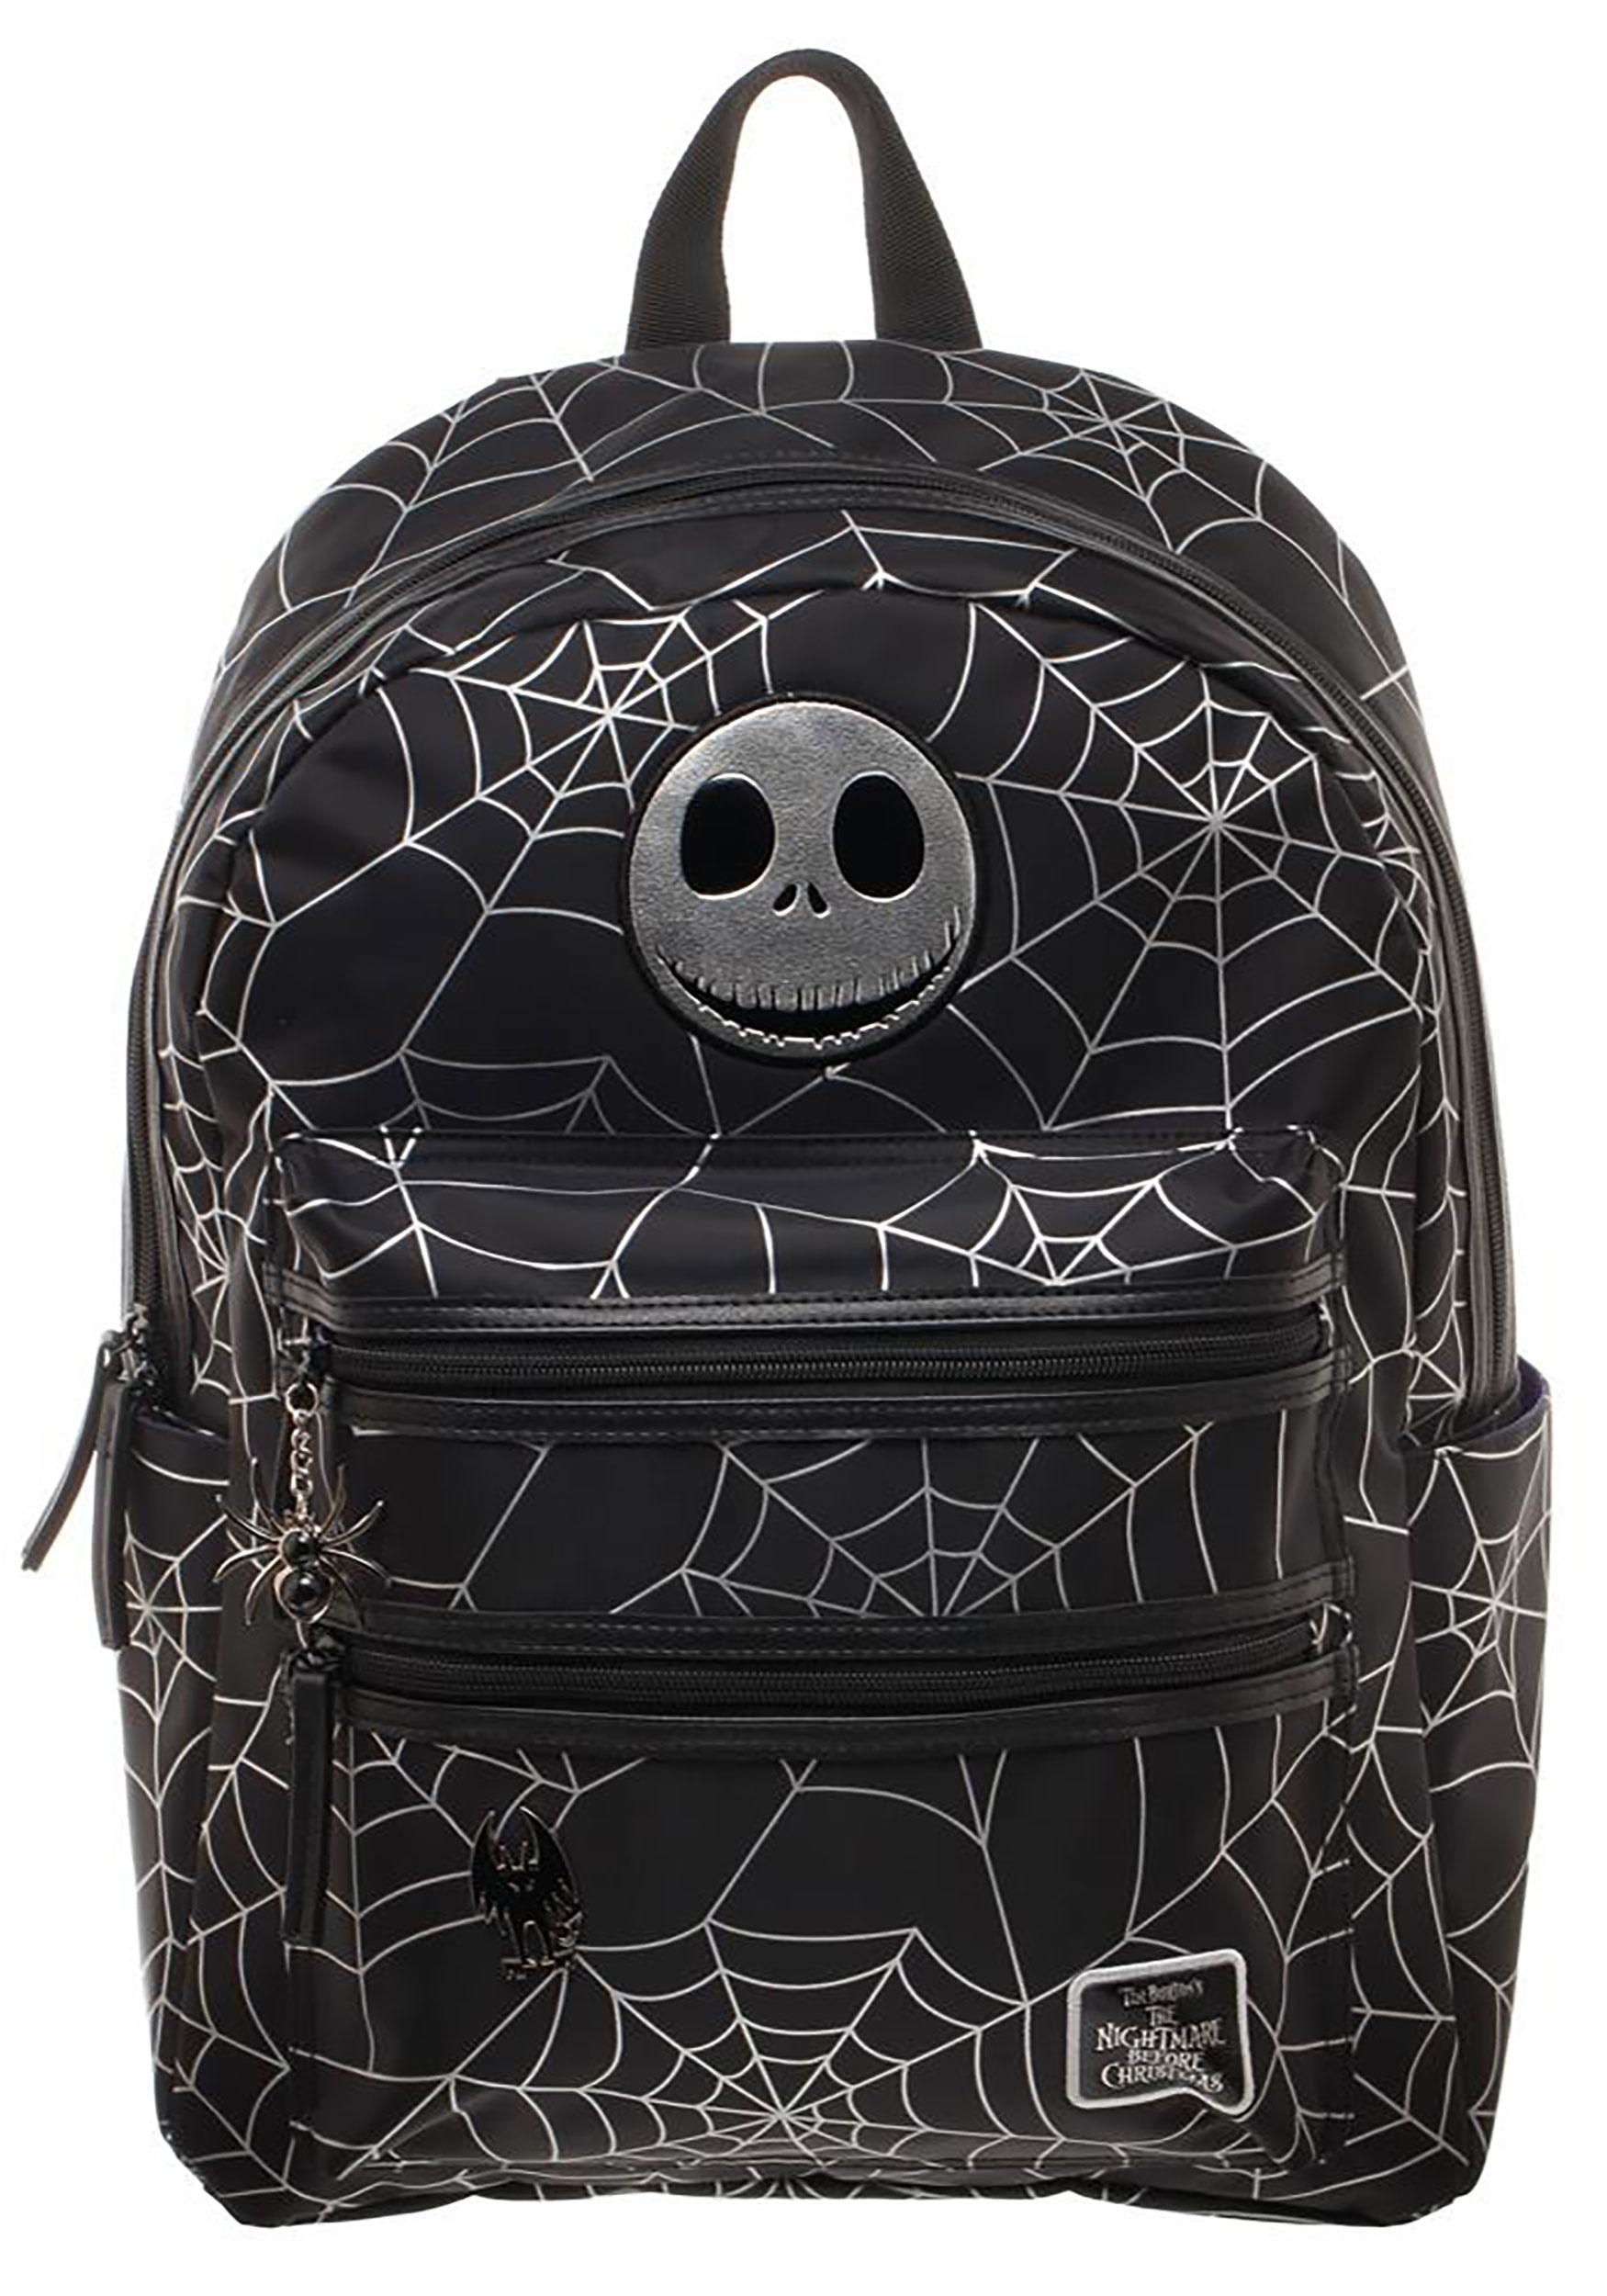 nightmare before christmas jack spider backpack - Nightmare Before Christmas Backpack